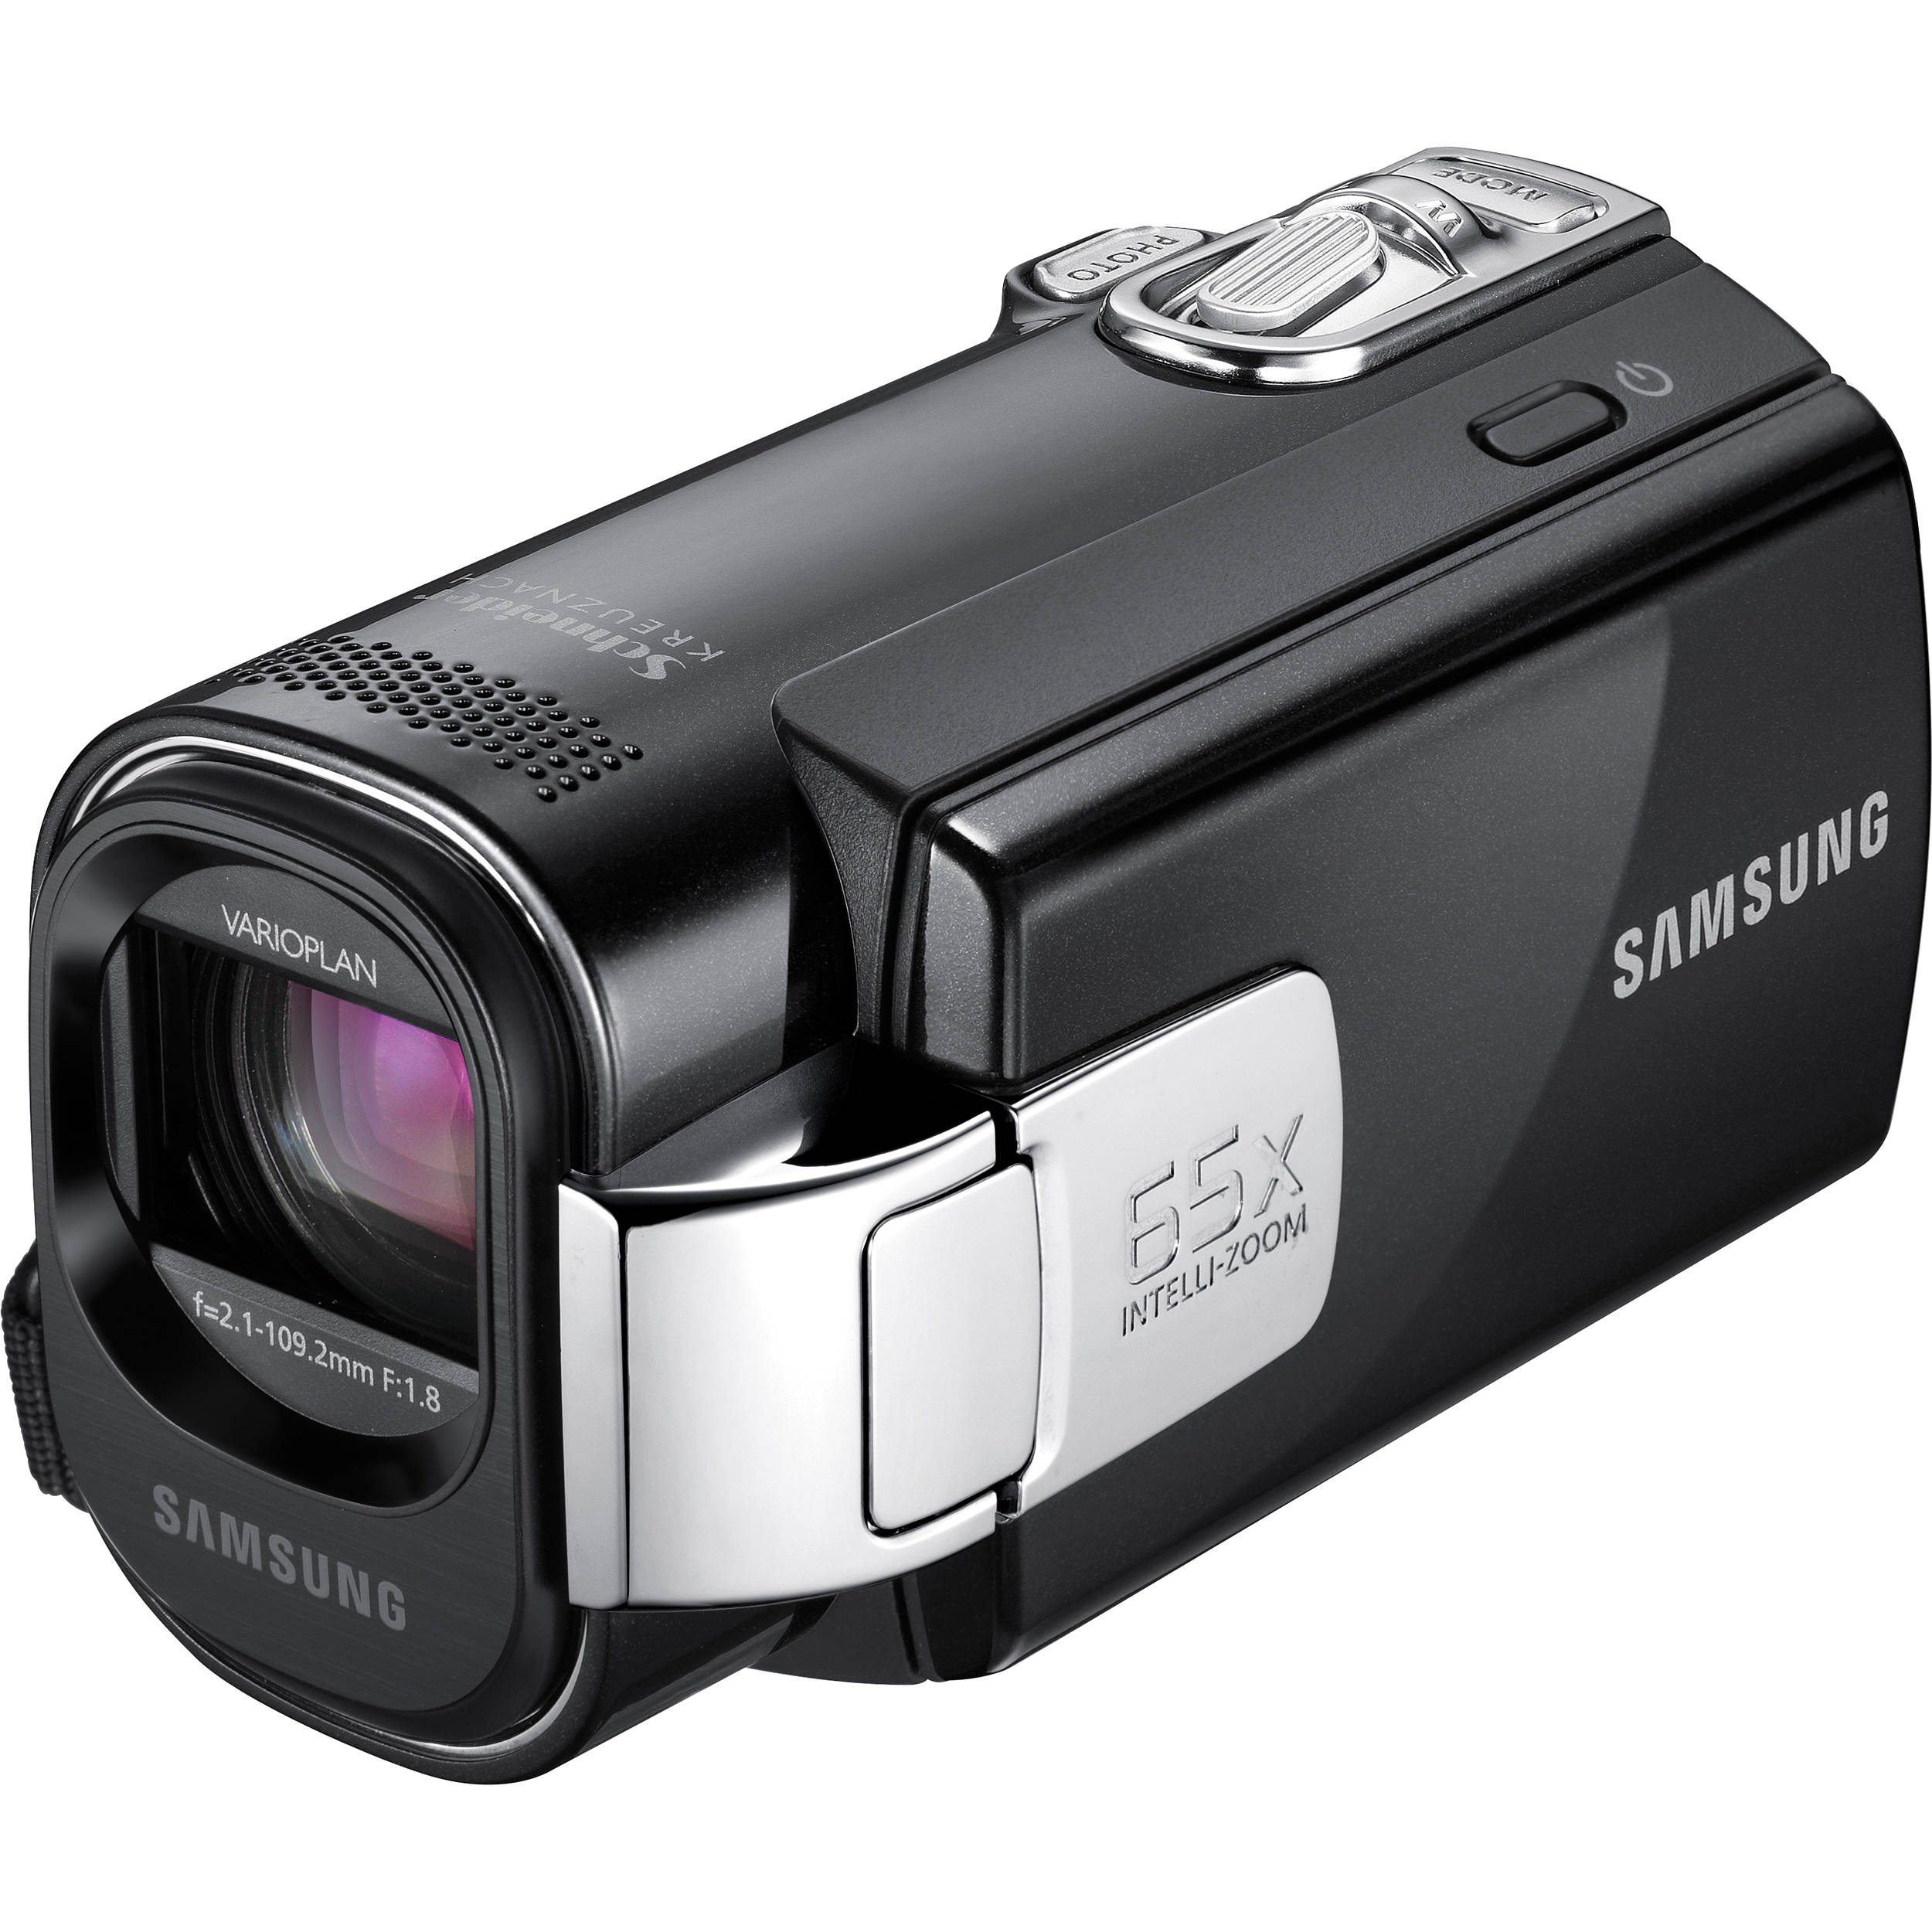 samsung smx f40 digital memory camcorder black smx f40bn xaa rh bhphotovideo com Samsung HMX-F90 Camcorder Samsung SC DX103 XAA Manual